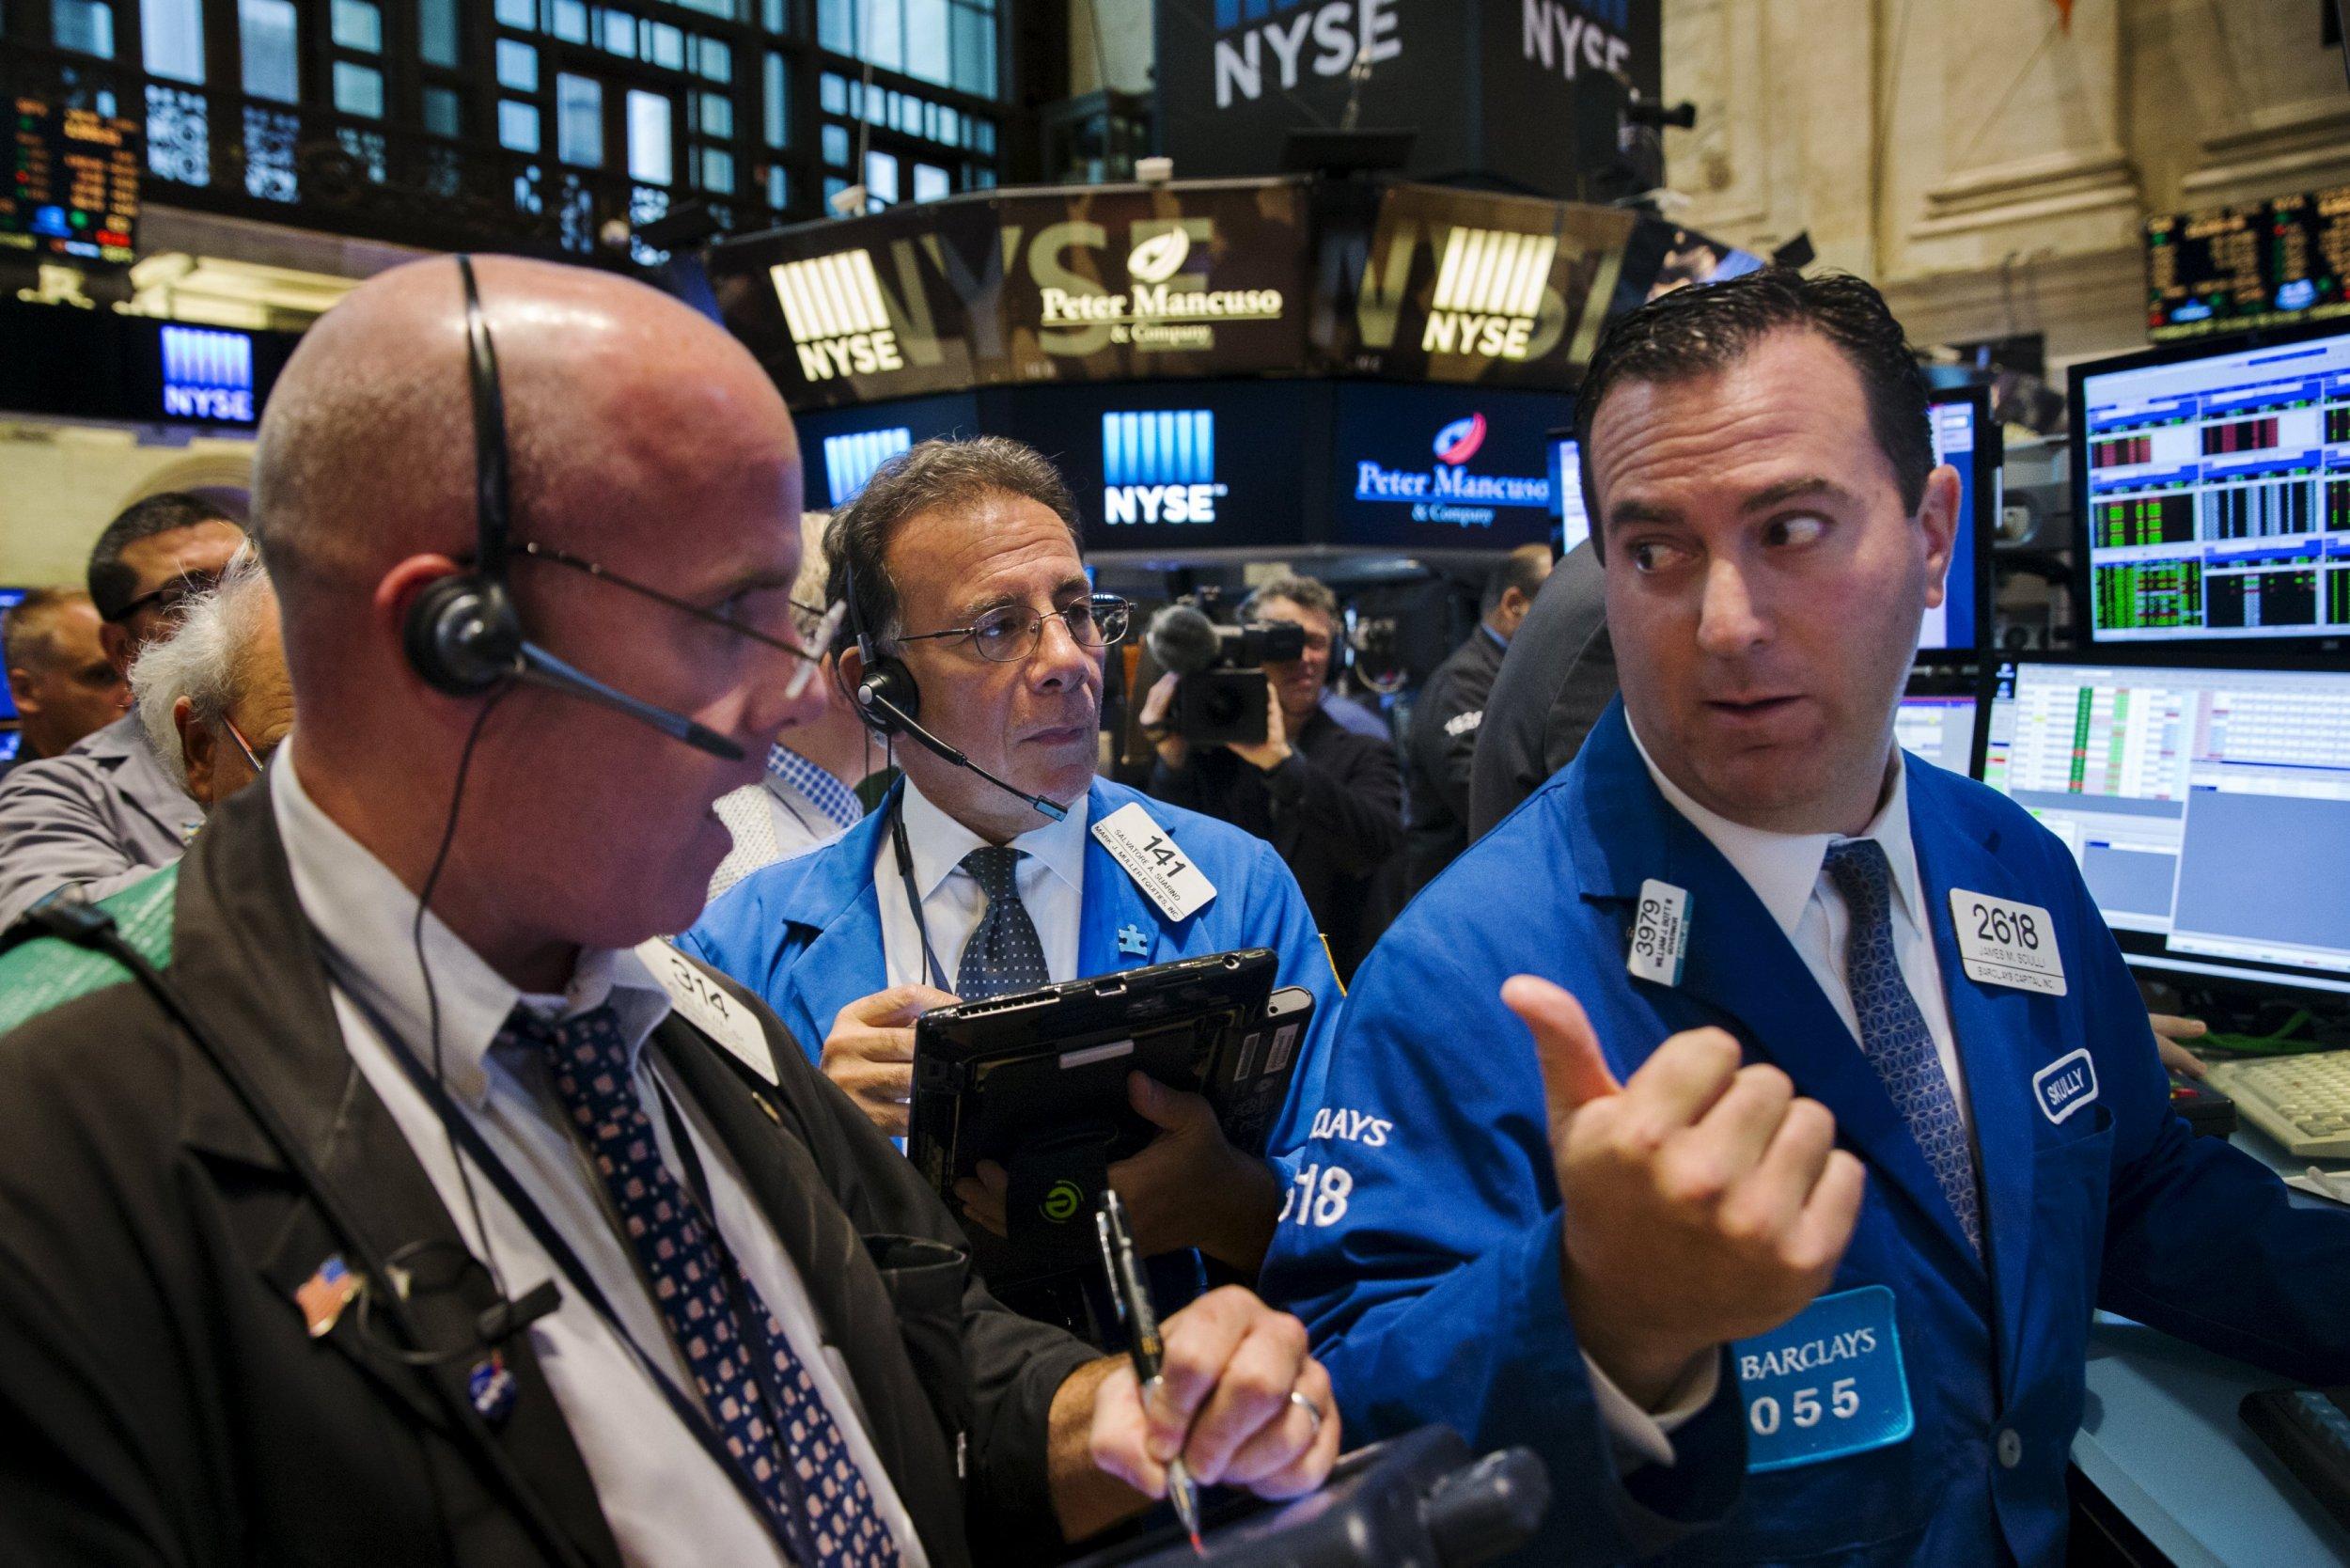 08_26_Stocks_01